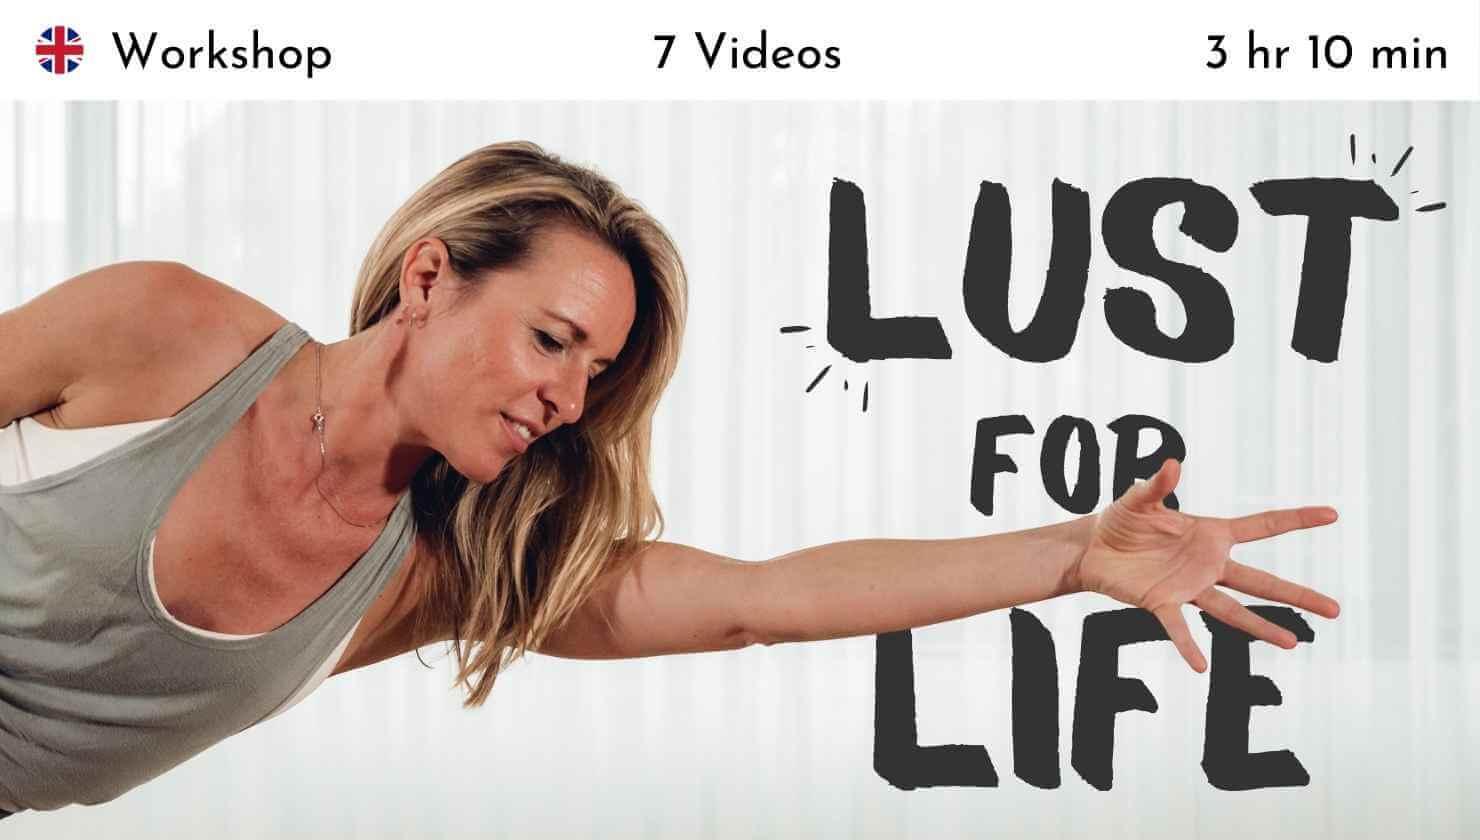 Thumbnails - Janine Lustforlife